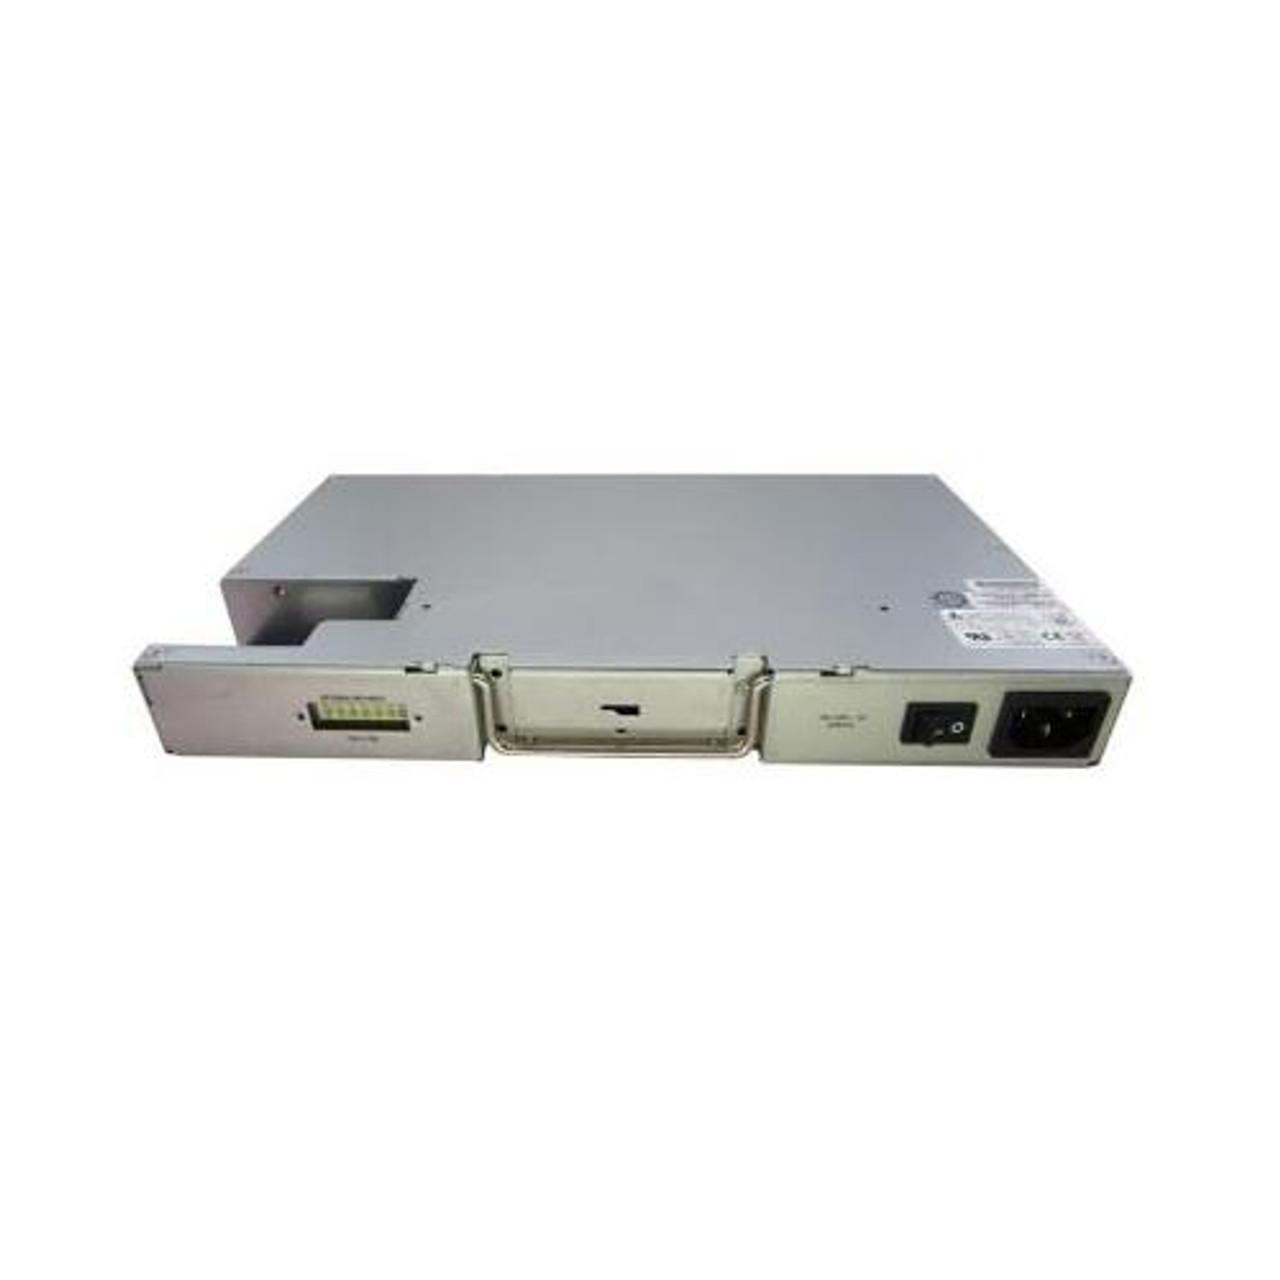 Cisco PWR-3825-AC CISCO 3825 AC POWER SUPPLY